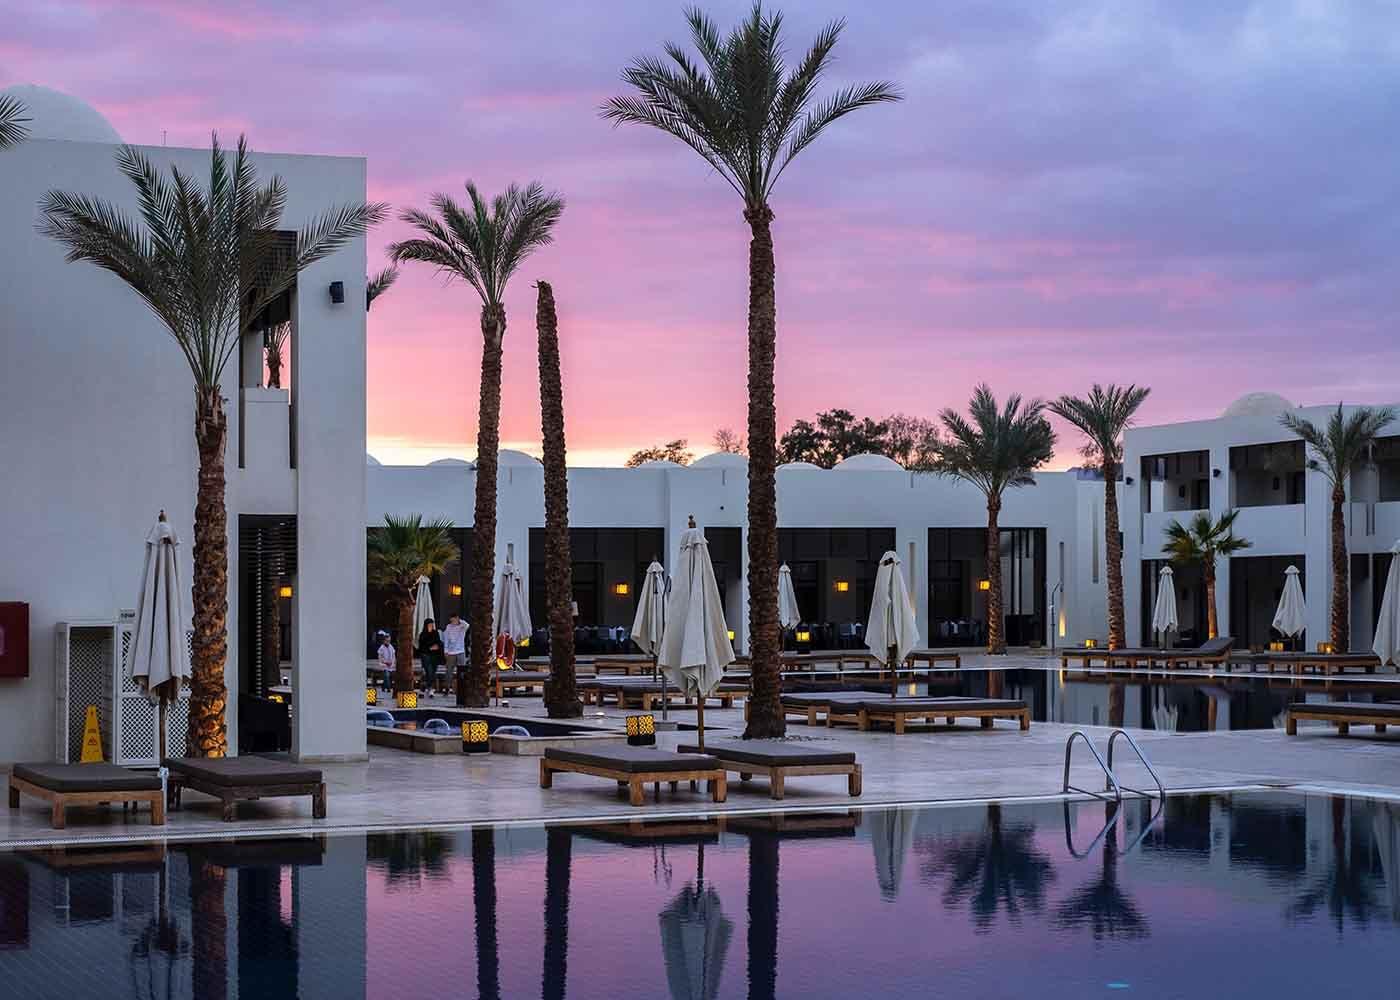 Luxury condo at sunset